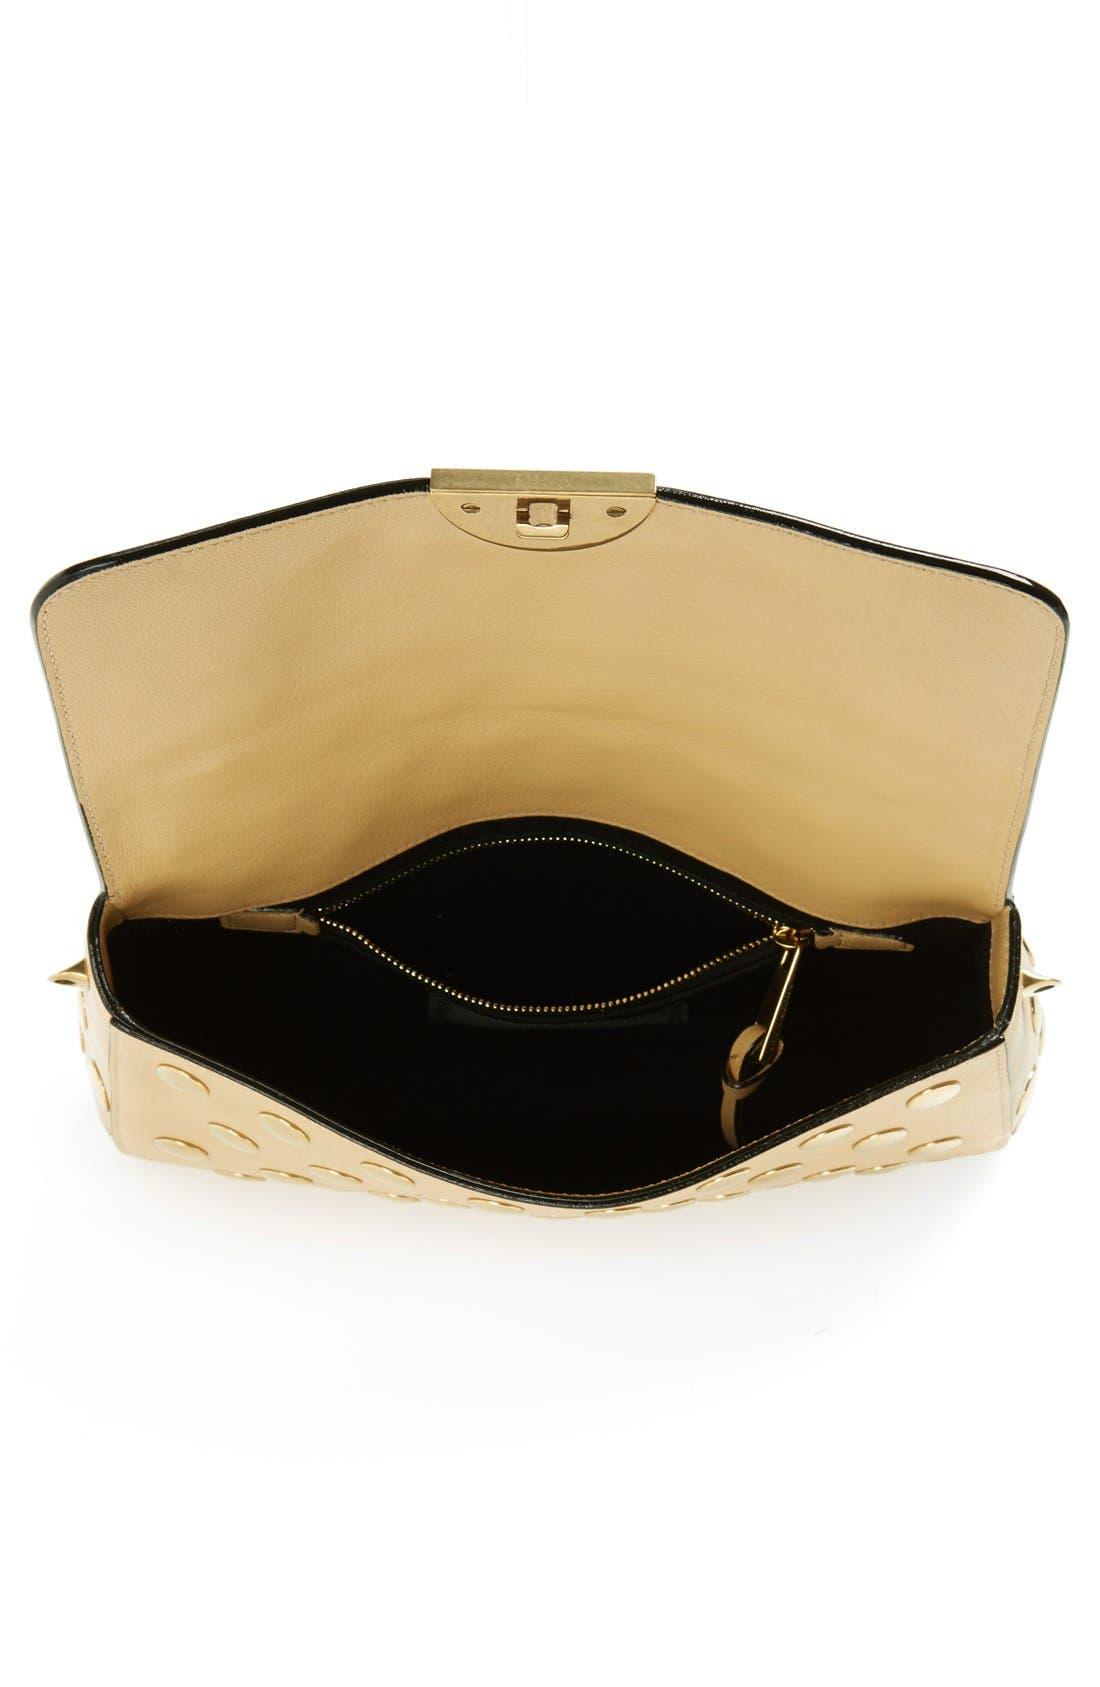 Alternate Image 3  - Marc Jacobs 'Small Gotham' Flat Stud Leather Shoulder Bag